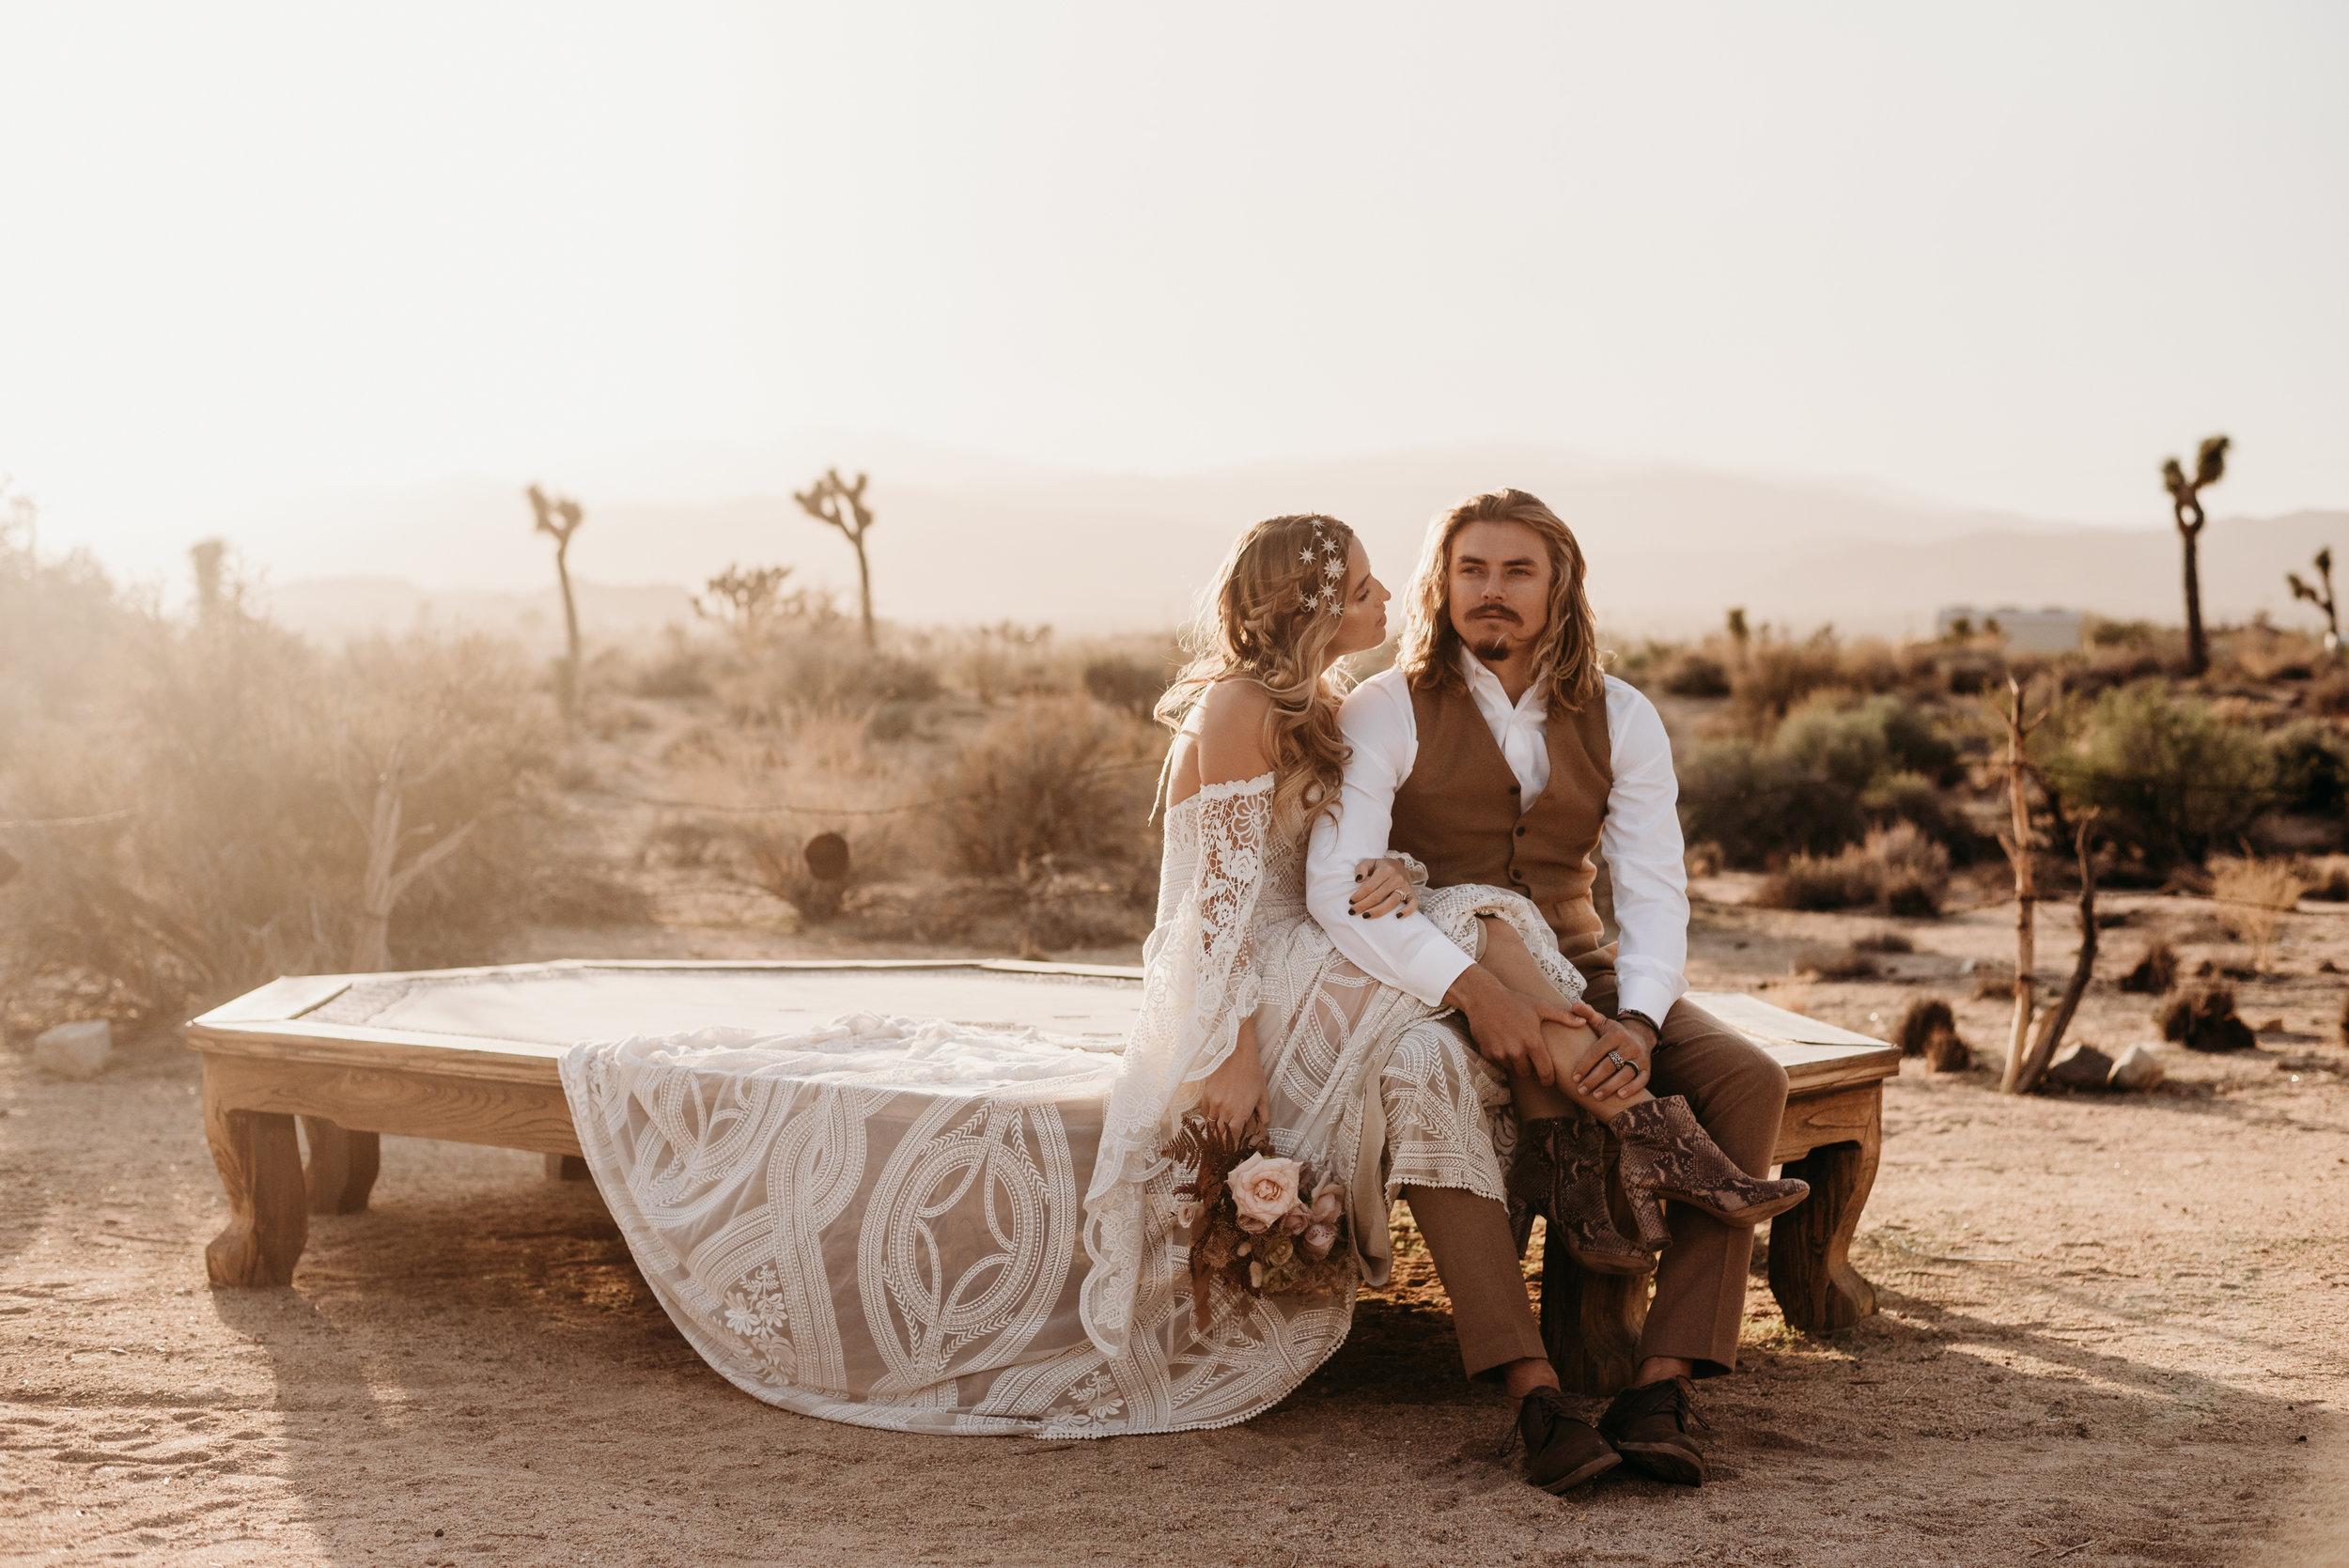 FortSt.John_photographer_TyraEPhotography_Wedding_Couple_Family_Photograhy_DawsonCreek_Elopement_Bride_Boduoir_Portraits-8080.jpg